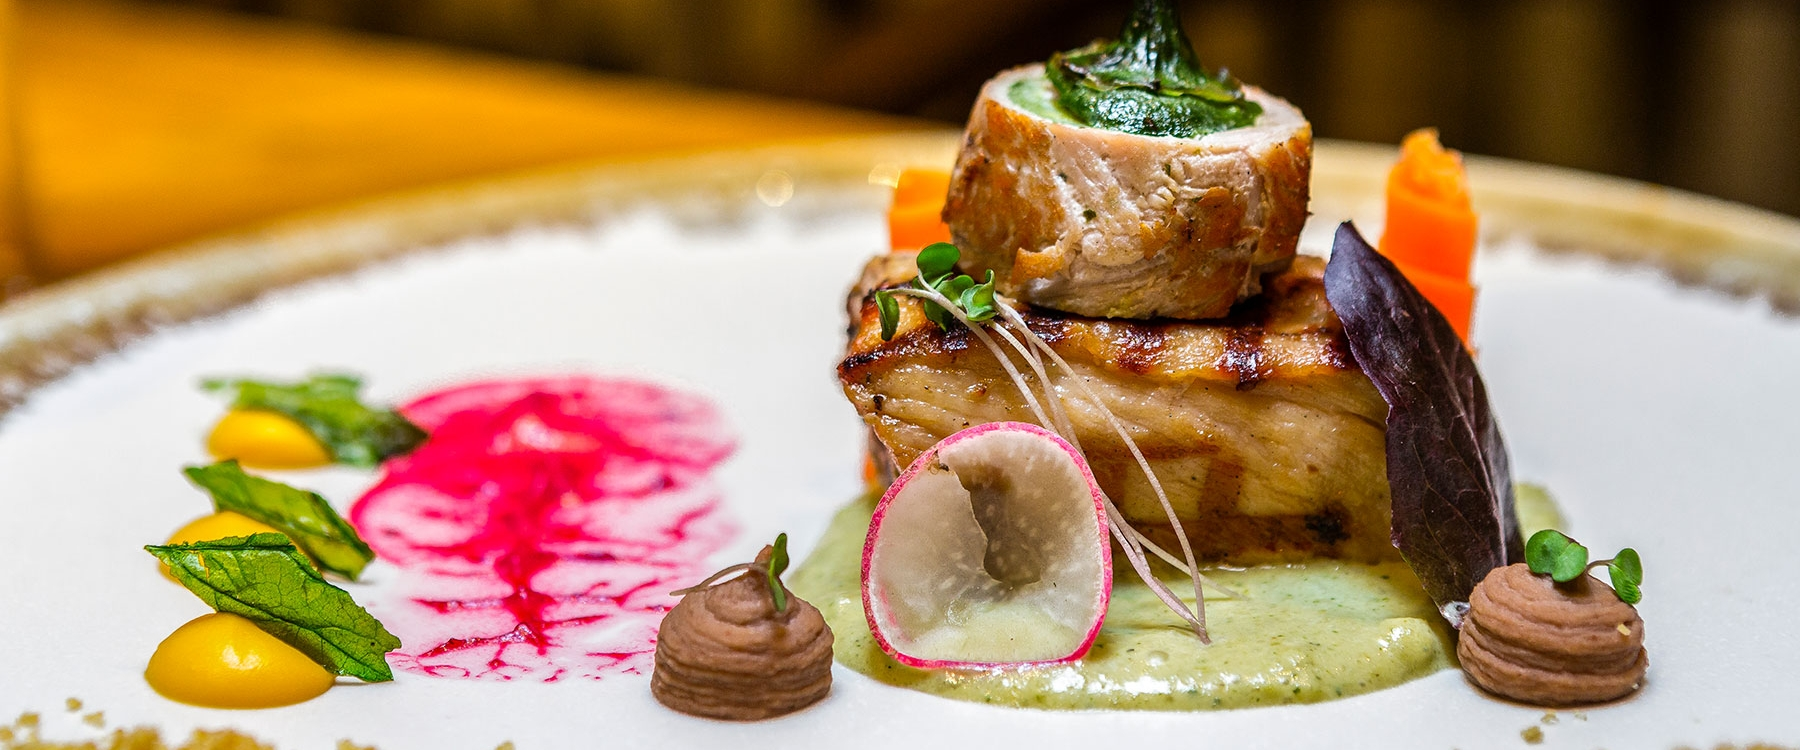 gastronomia-main.jpg